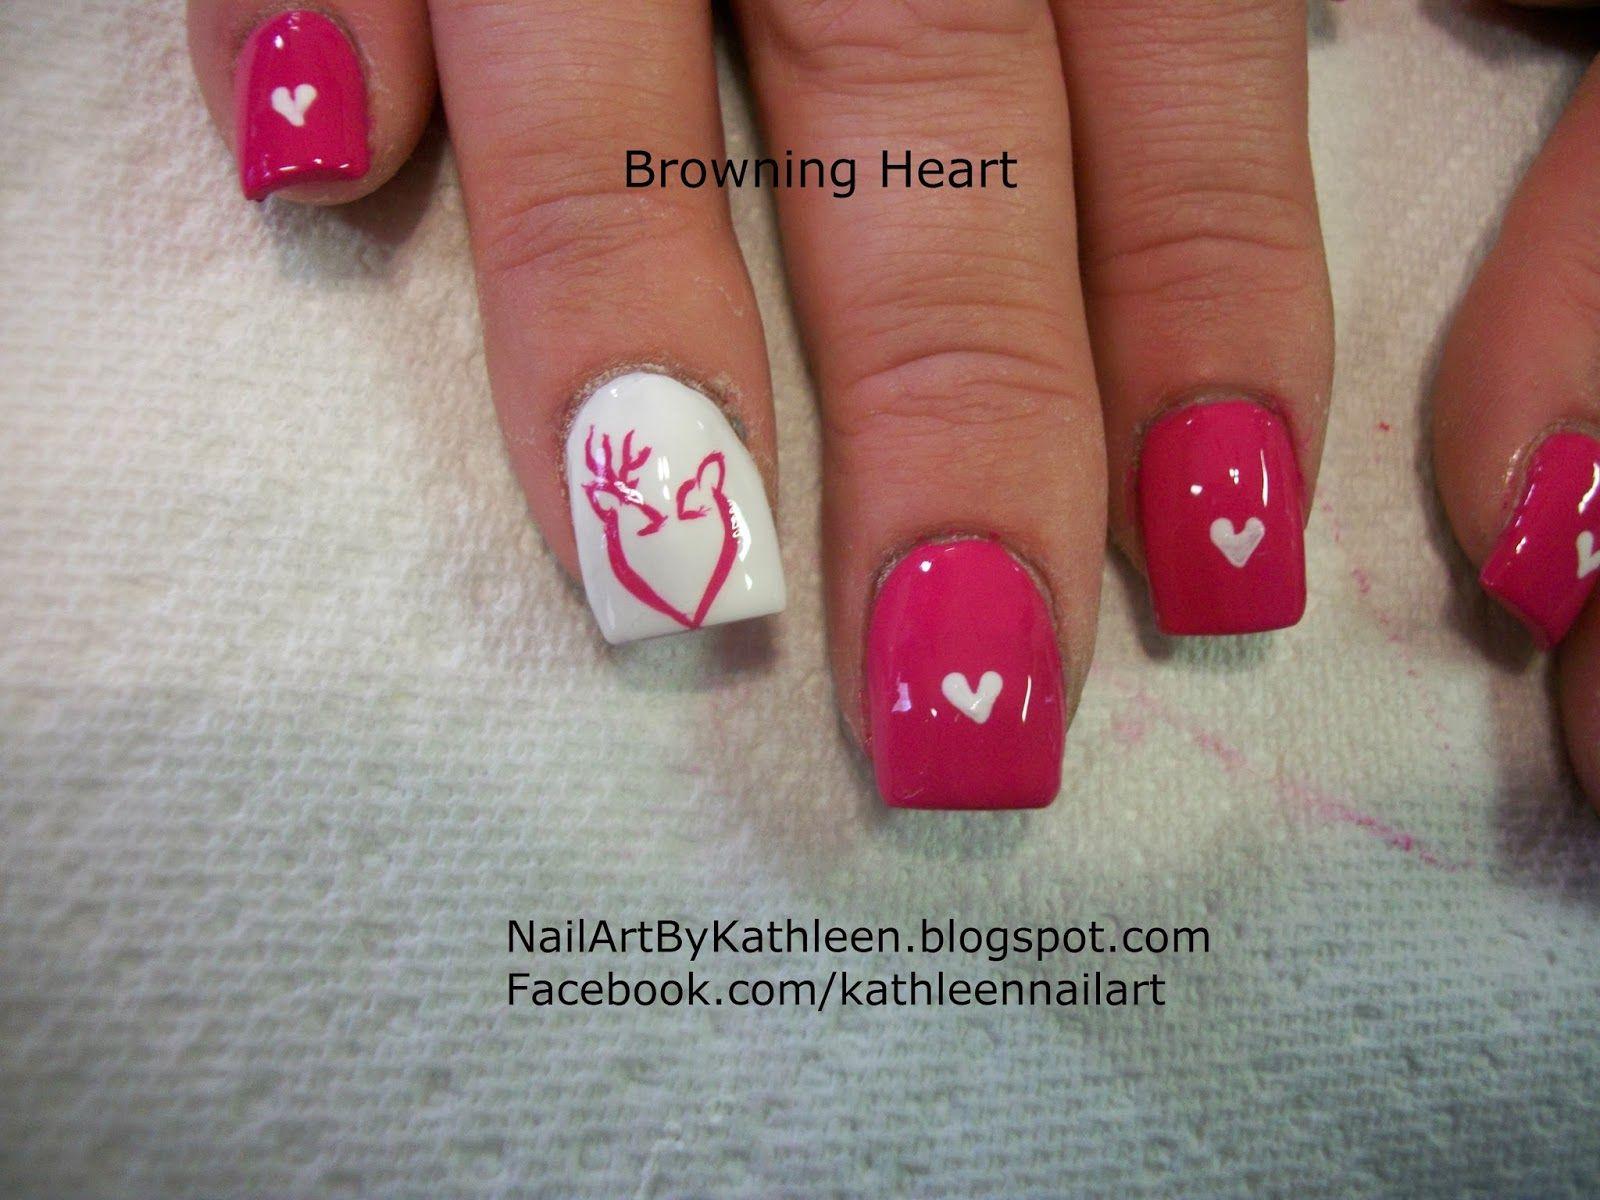 hunting nail designs - Google Search   Nailed it!   Pinterest ...